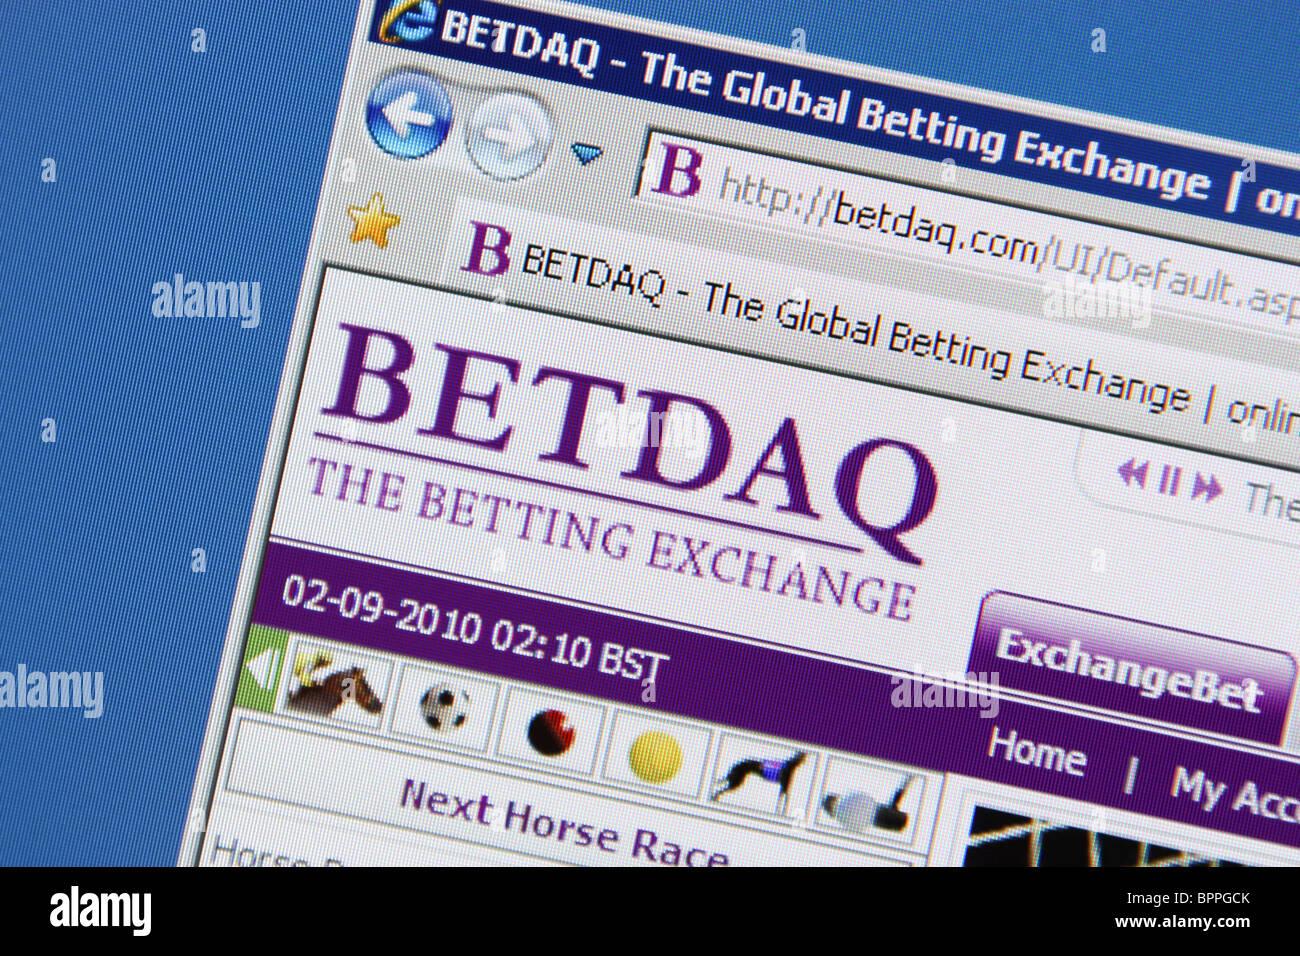 BETDAQ Global Betting Exchange Online - Stock Image